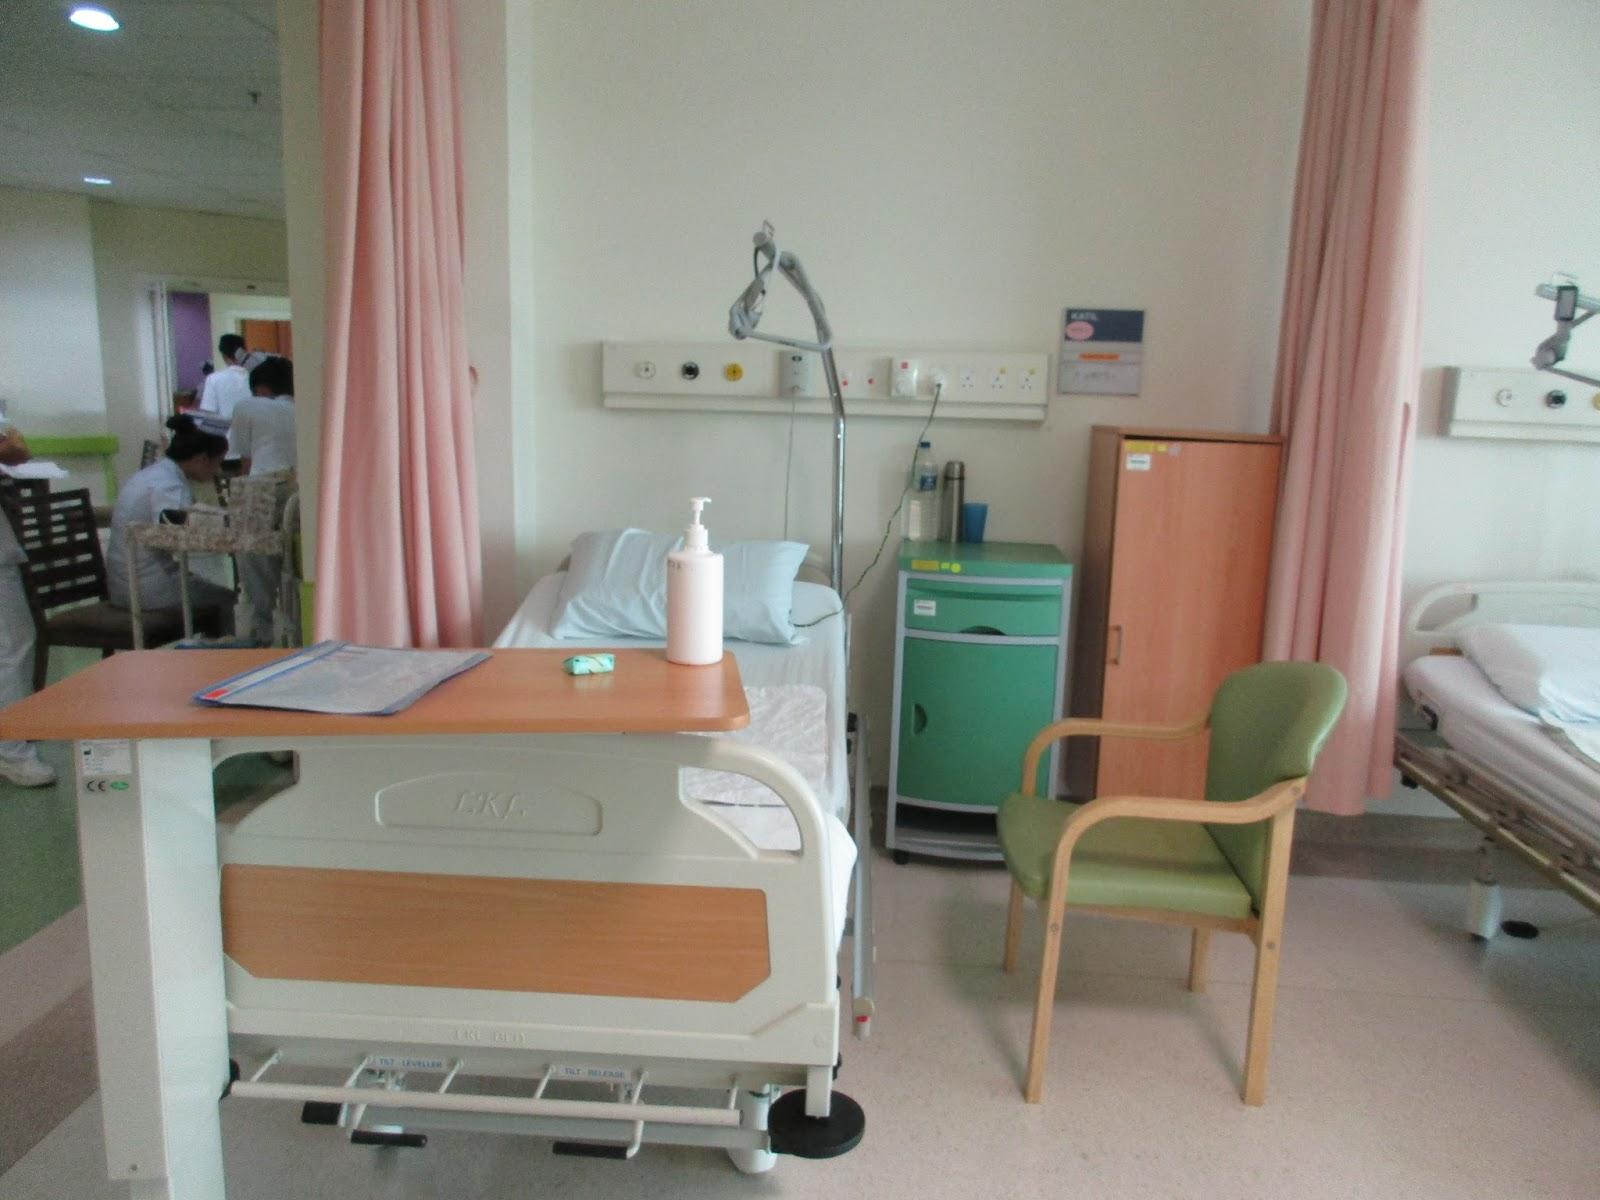 Hospital rooms at Hospital Queen Elizabeth